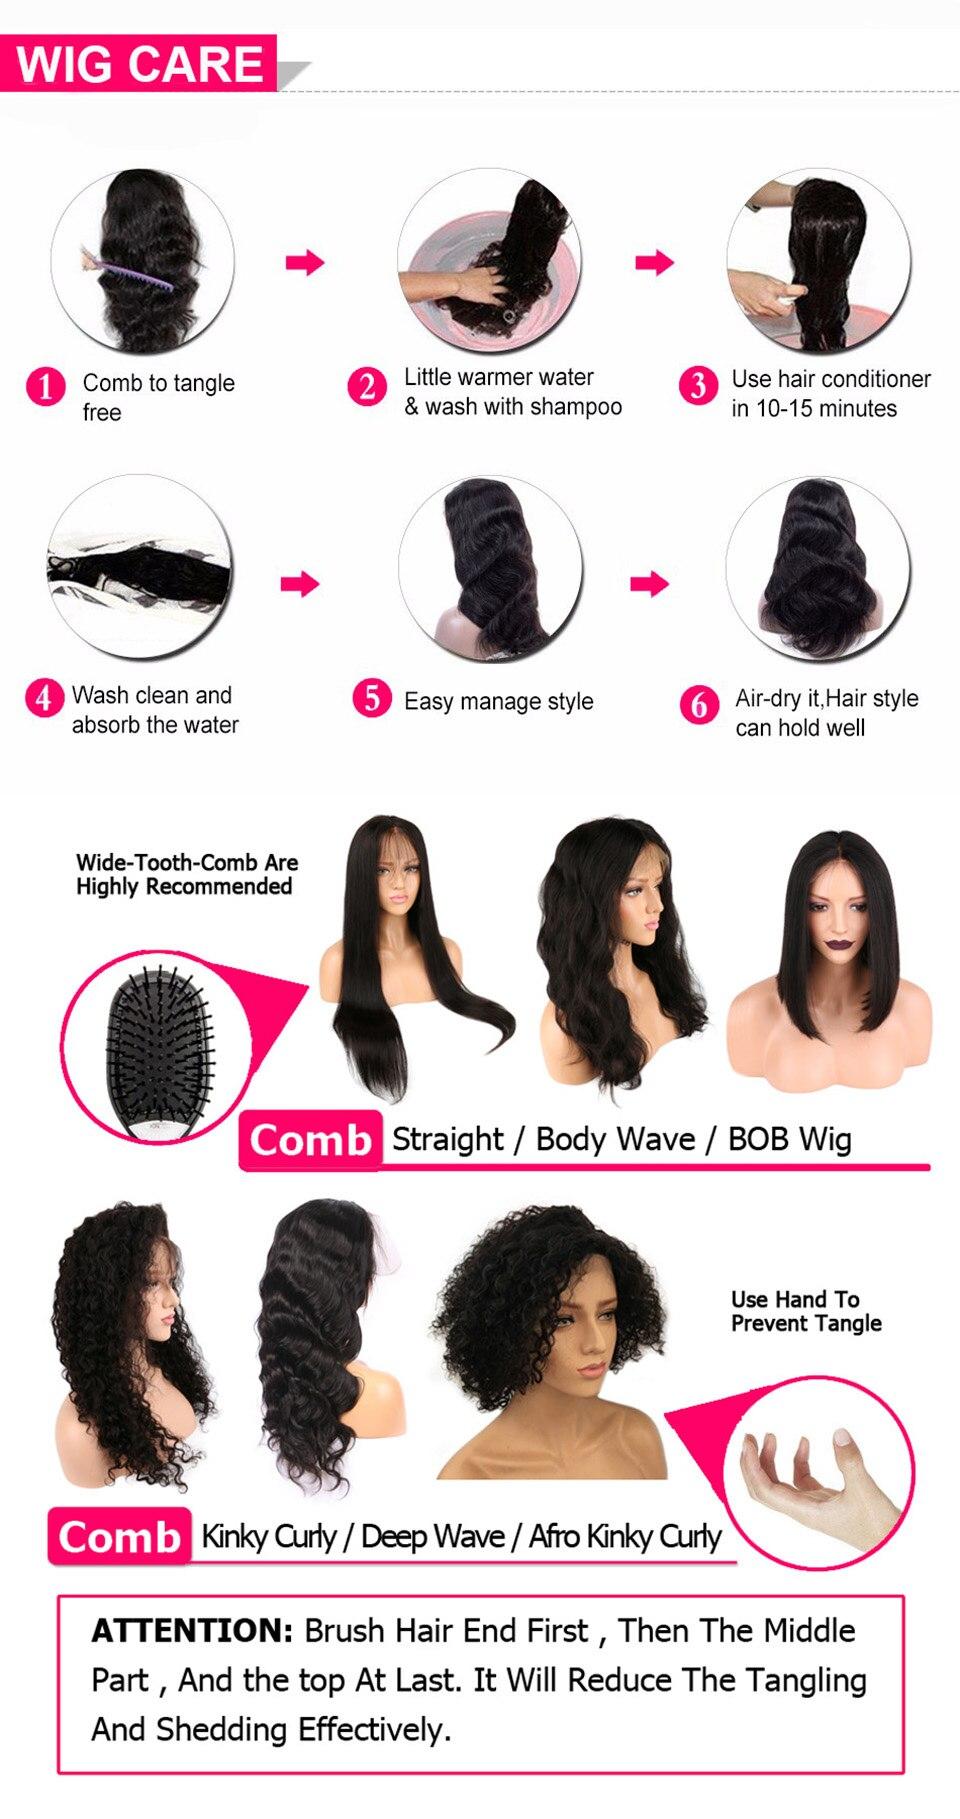 wig care(1)